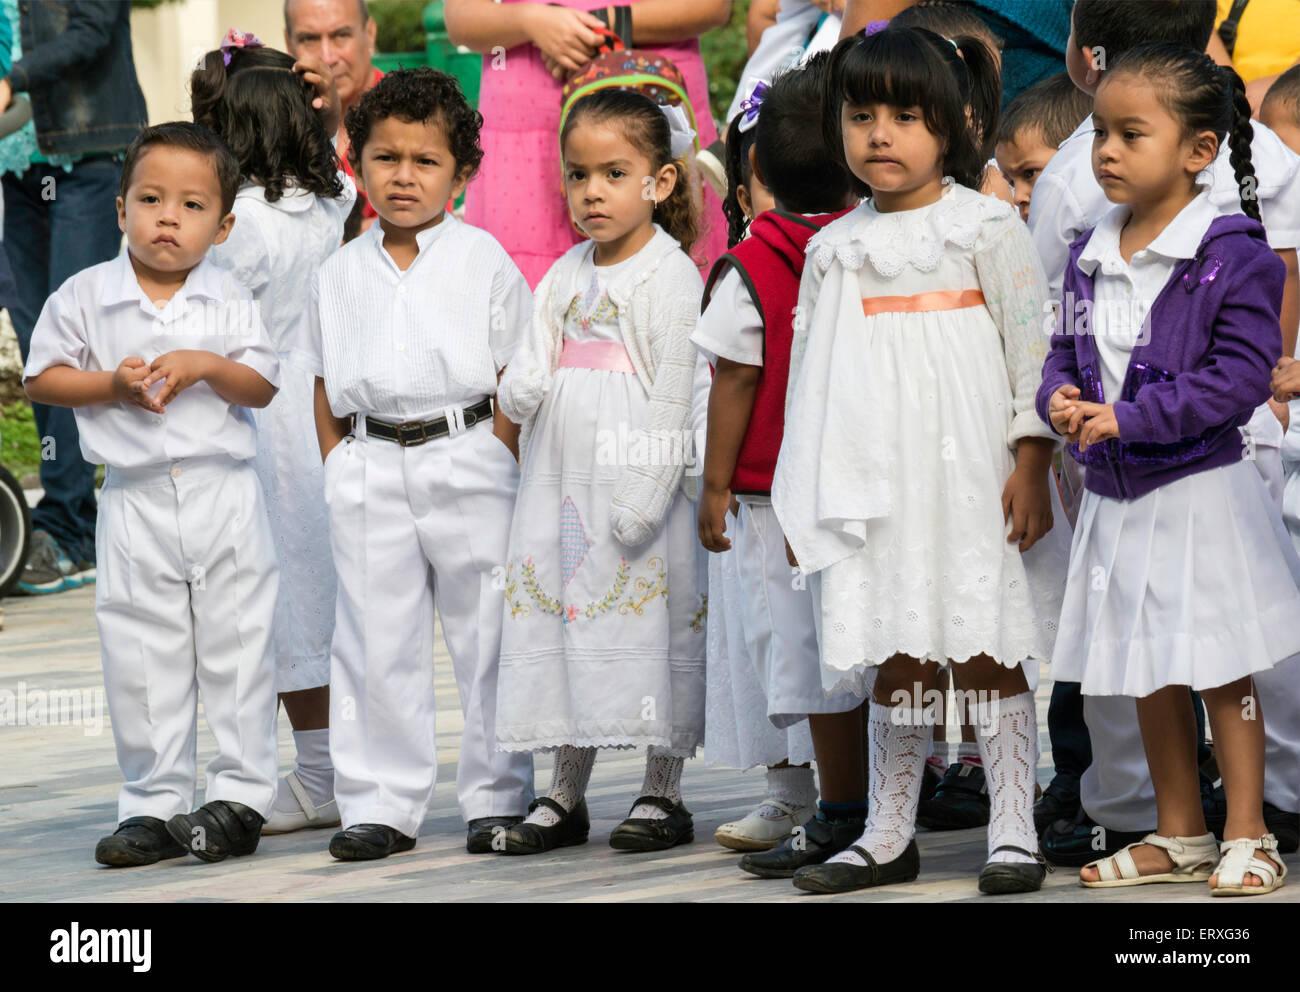 Children at school ceremony at Plaza Zaragoza, zocalo in Tlacotalpan, Veracruz state, Mexico - Stock Image